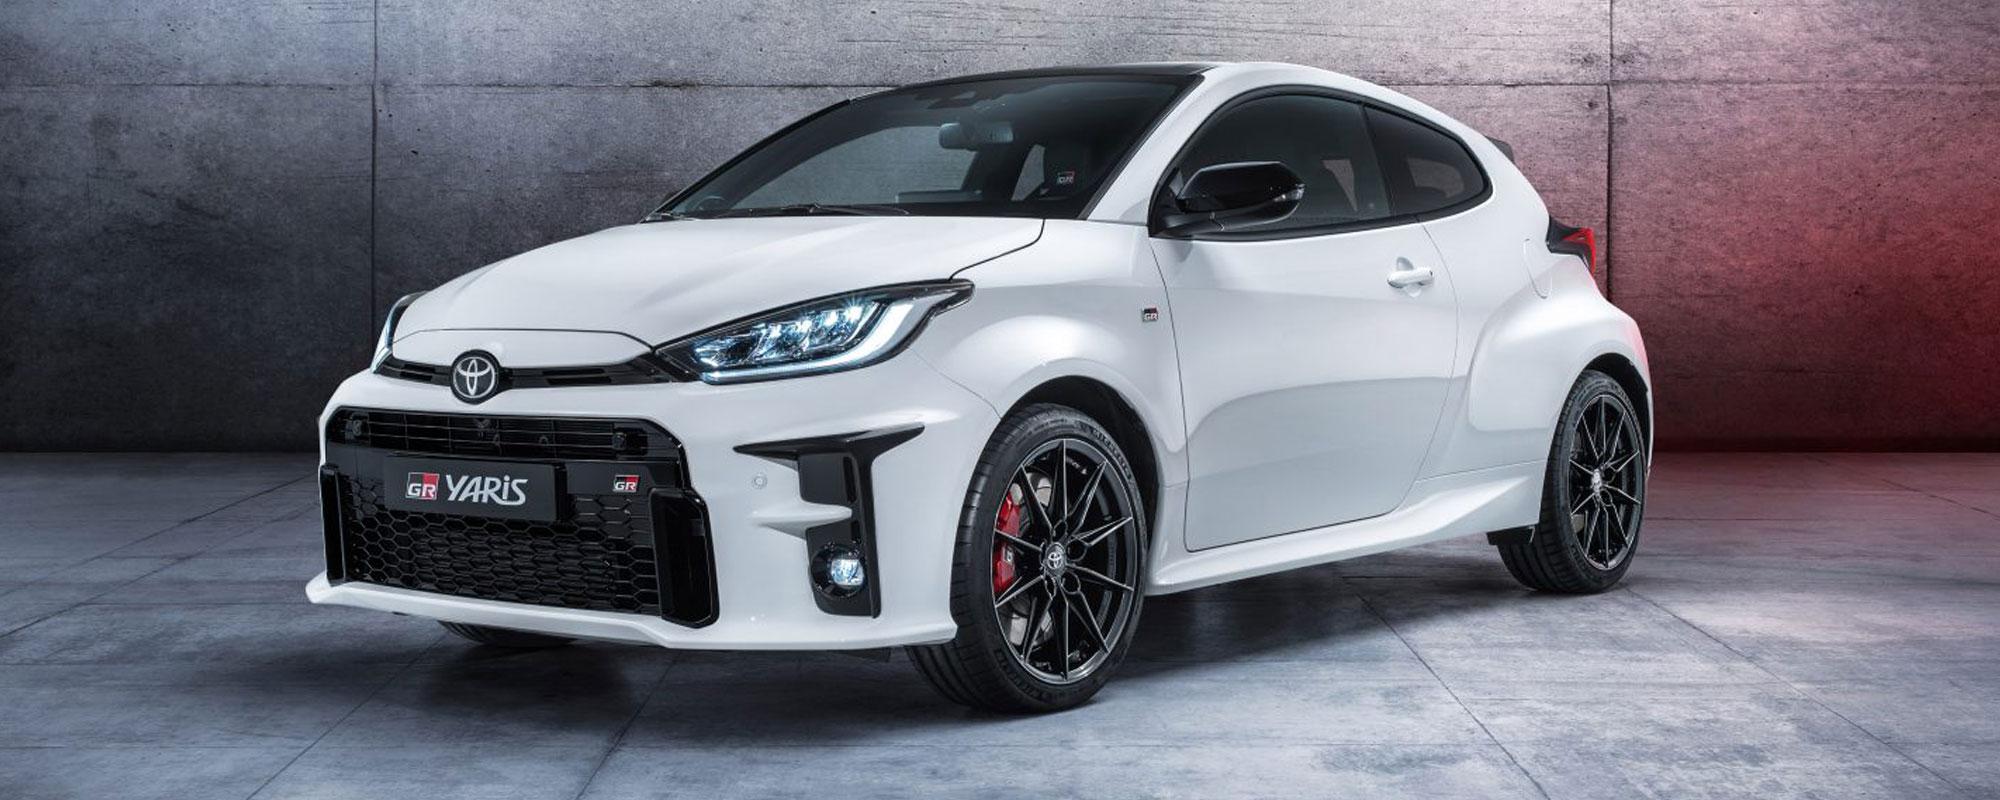 Garage-Ramaker-High-performance-Toyota-GR-Yaris